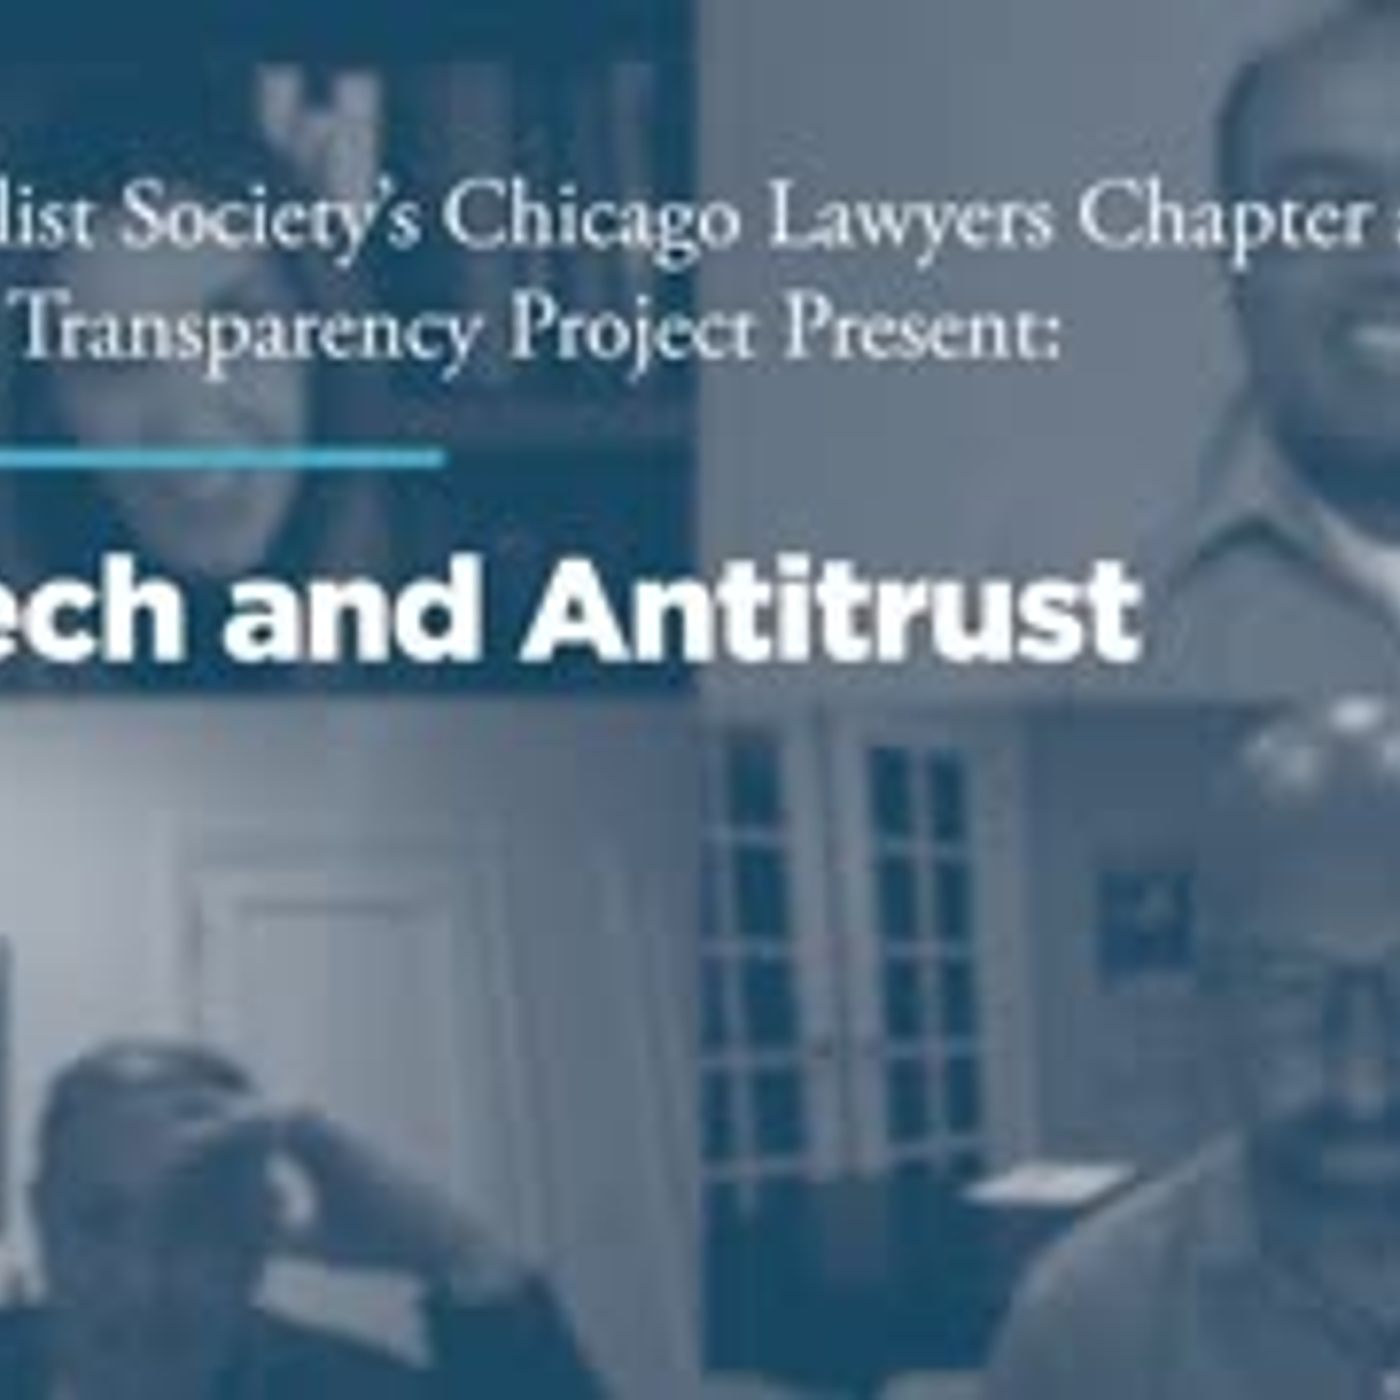 Big Tech and Antitrust